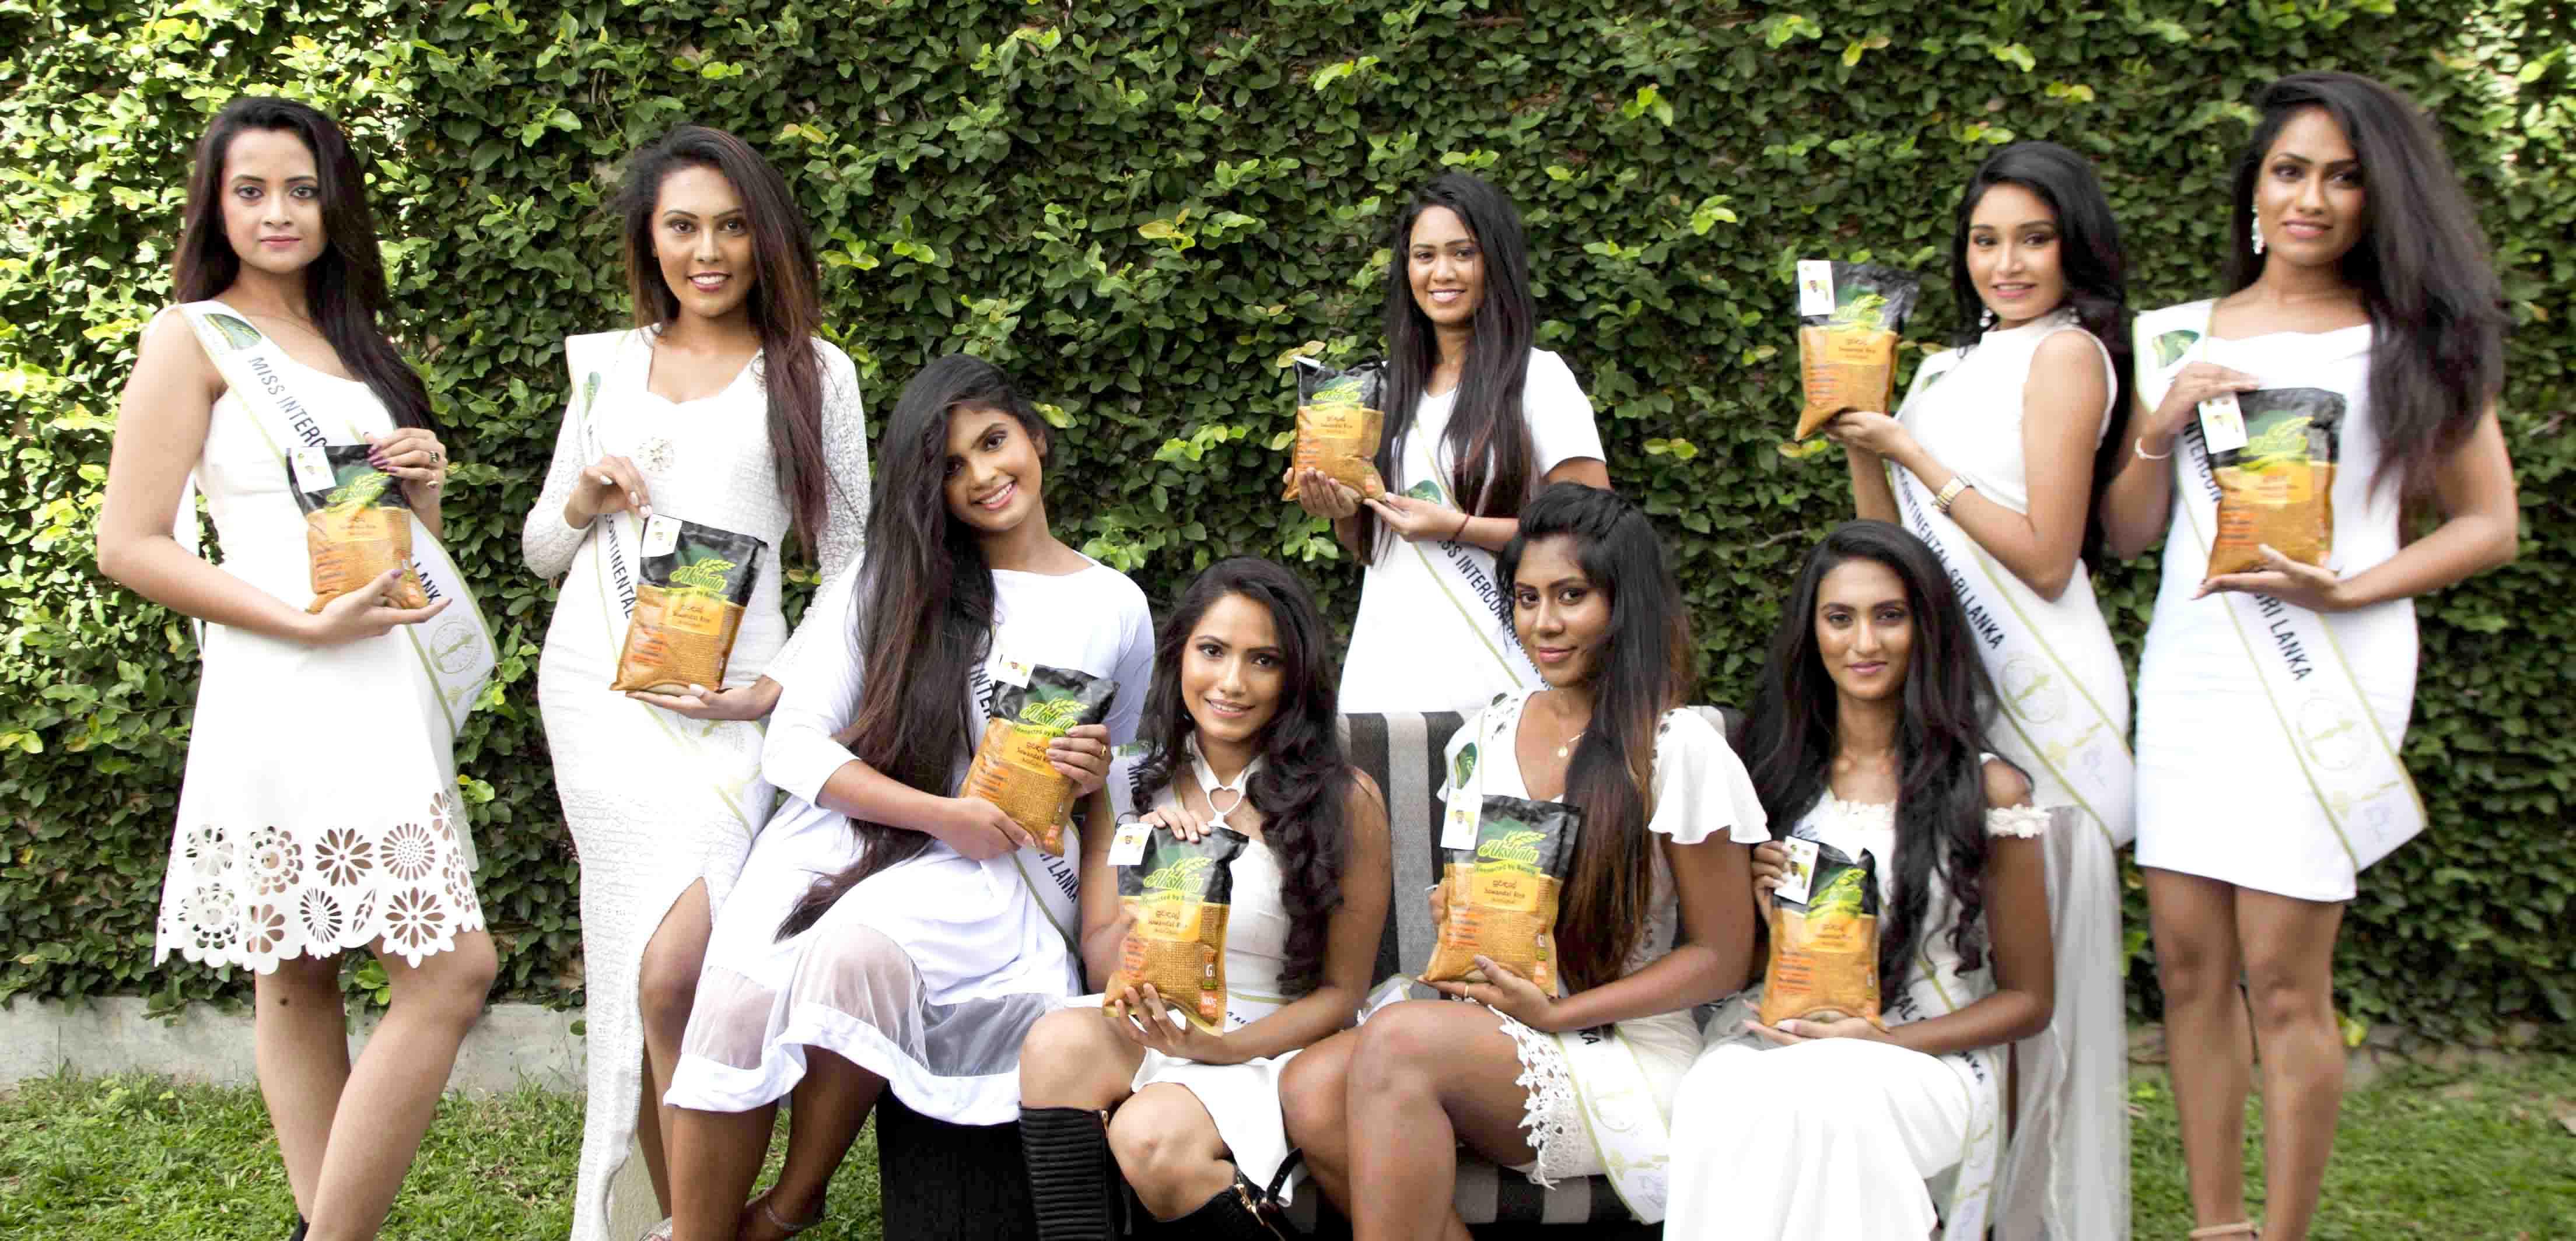 AKSHATA suwandal traditional sri lankan rice-glowing skin-luscious hair-roshan perera